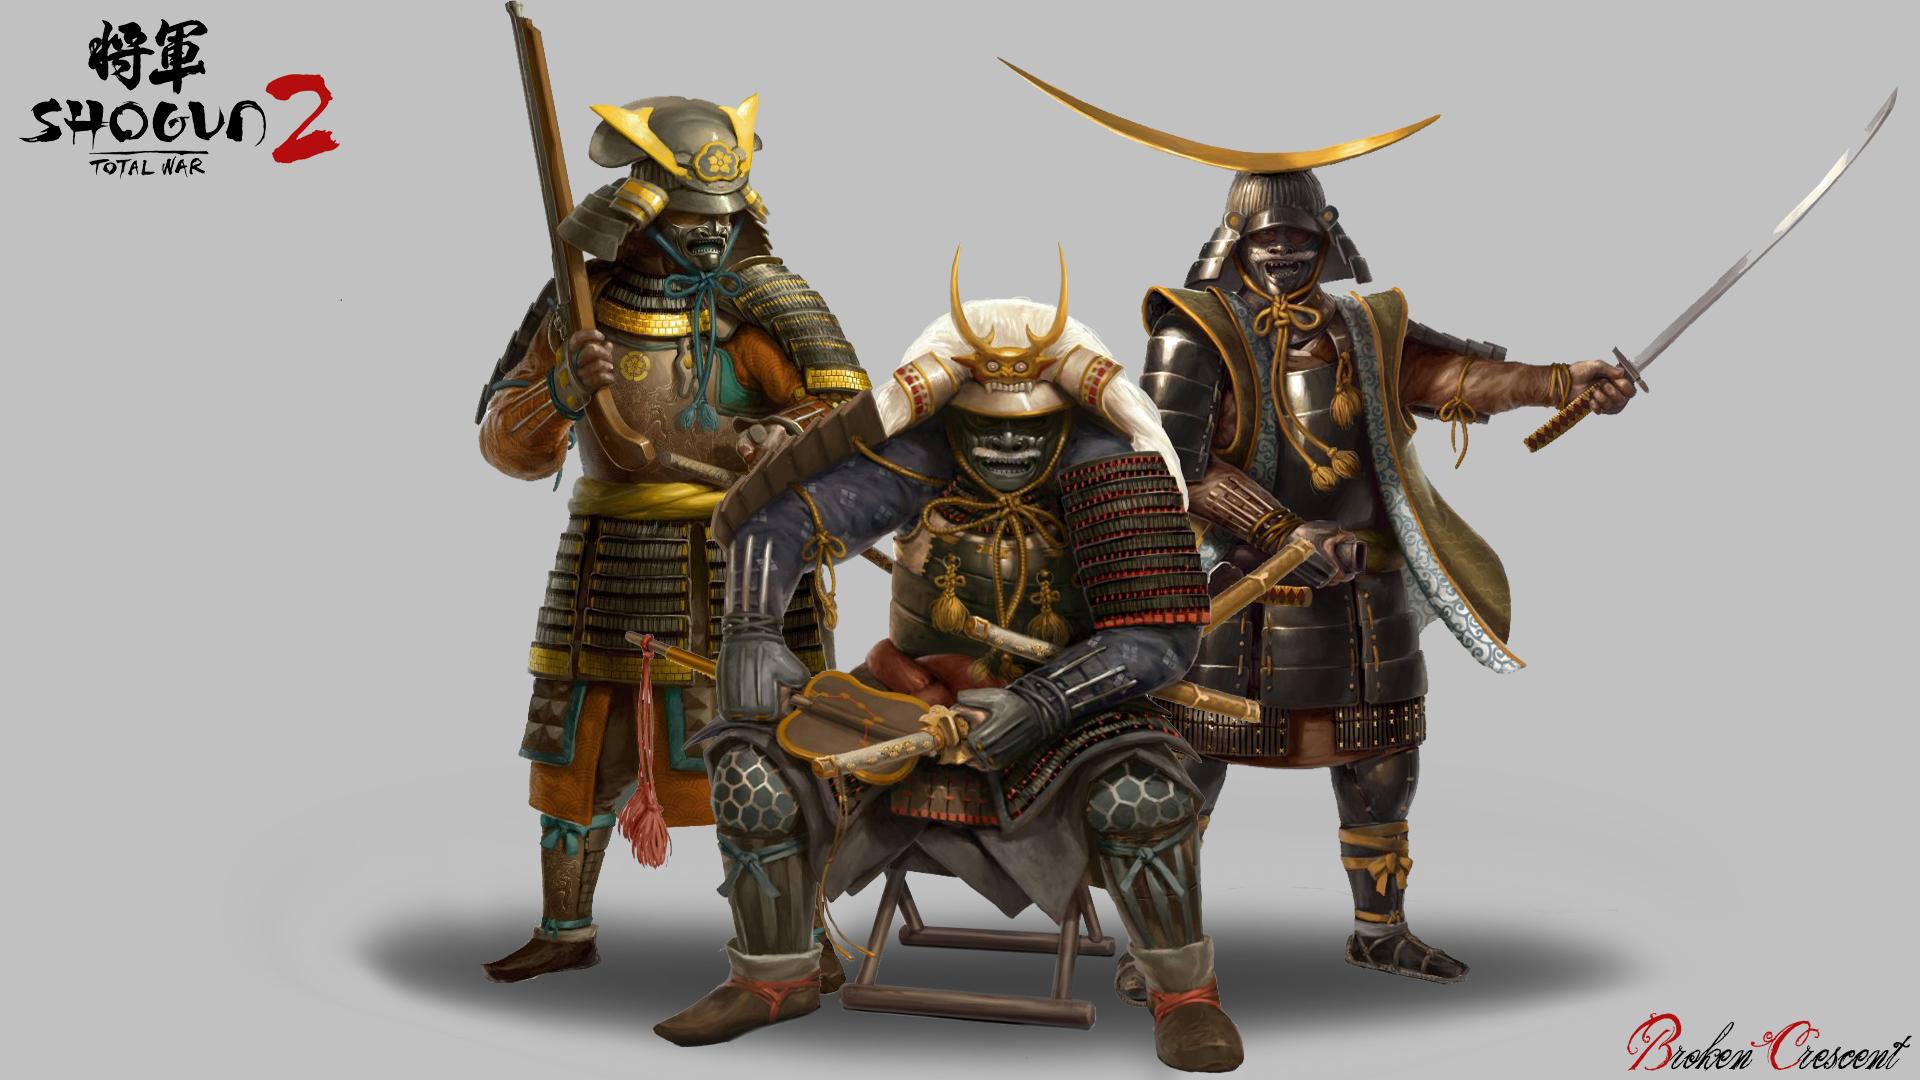 Shogun total war quotes